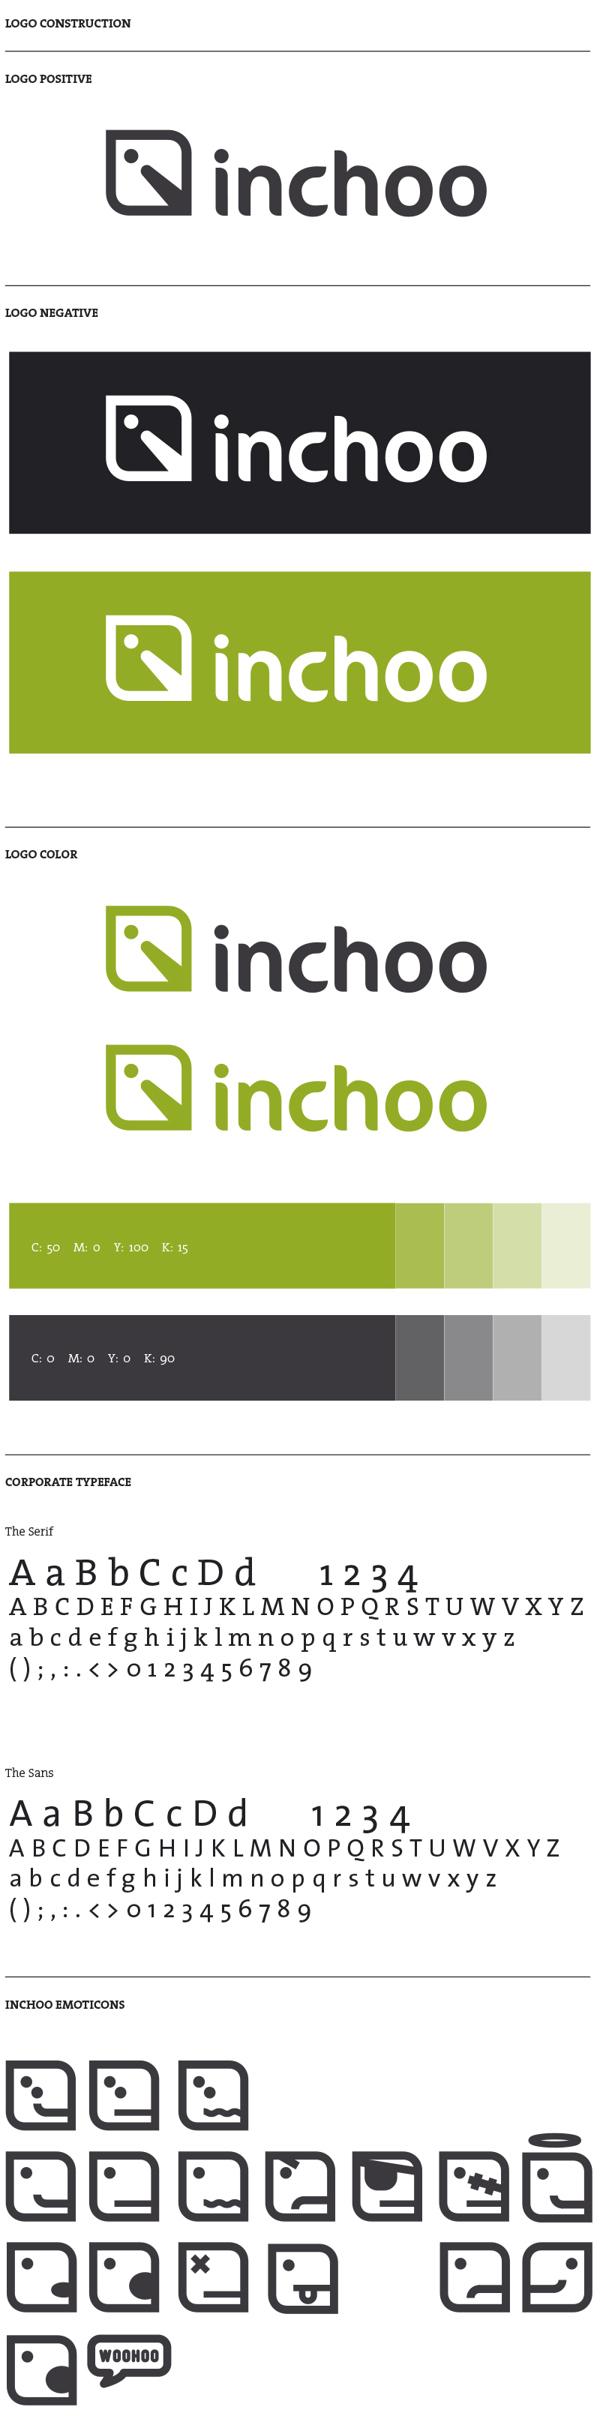 Inchoo - Logo Construction